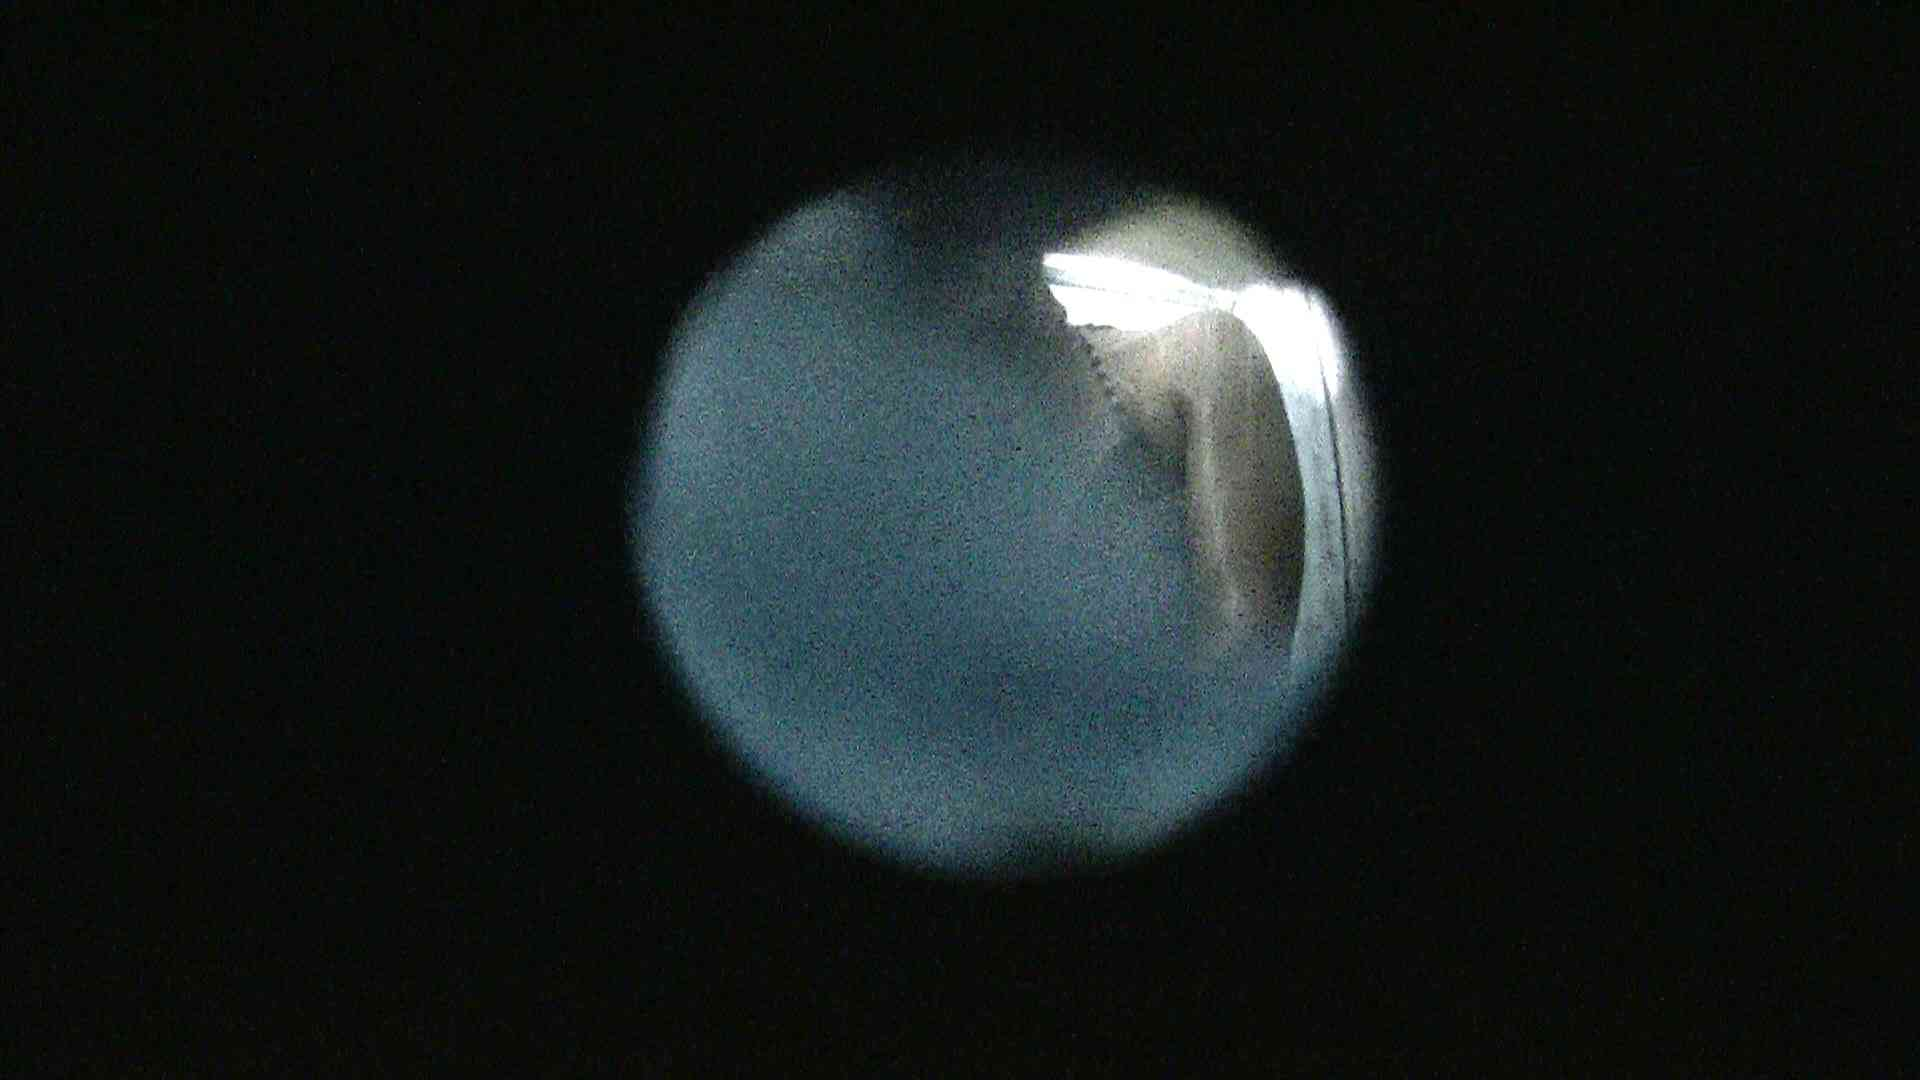 NO.13 暗いですが豪快な砂落としが好印象 シャワー | シャワー室  88PIX 16